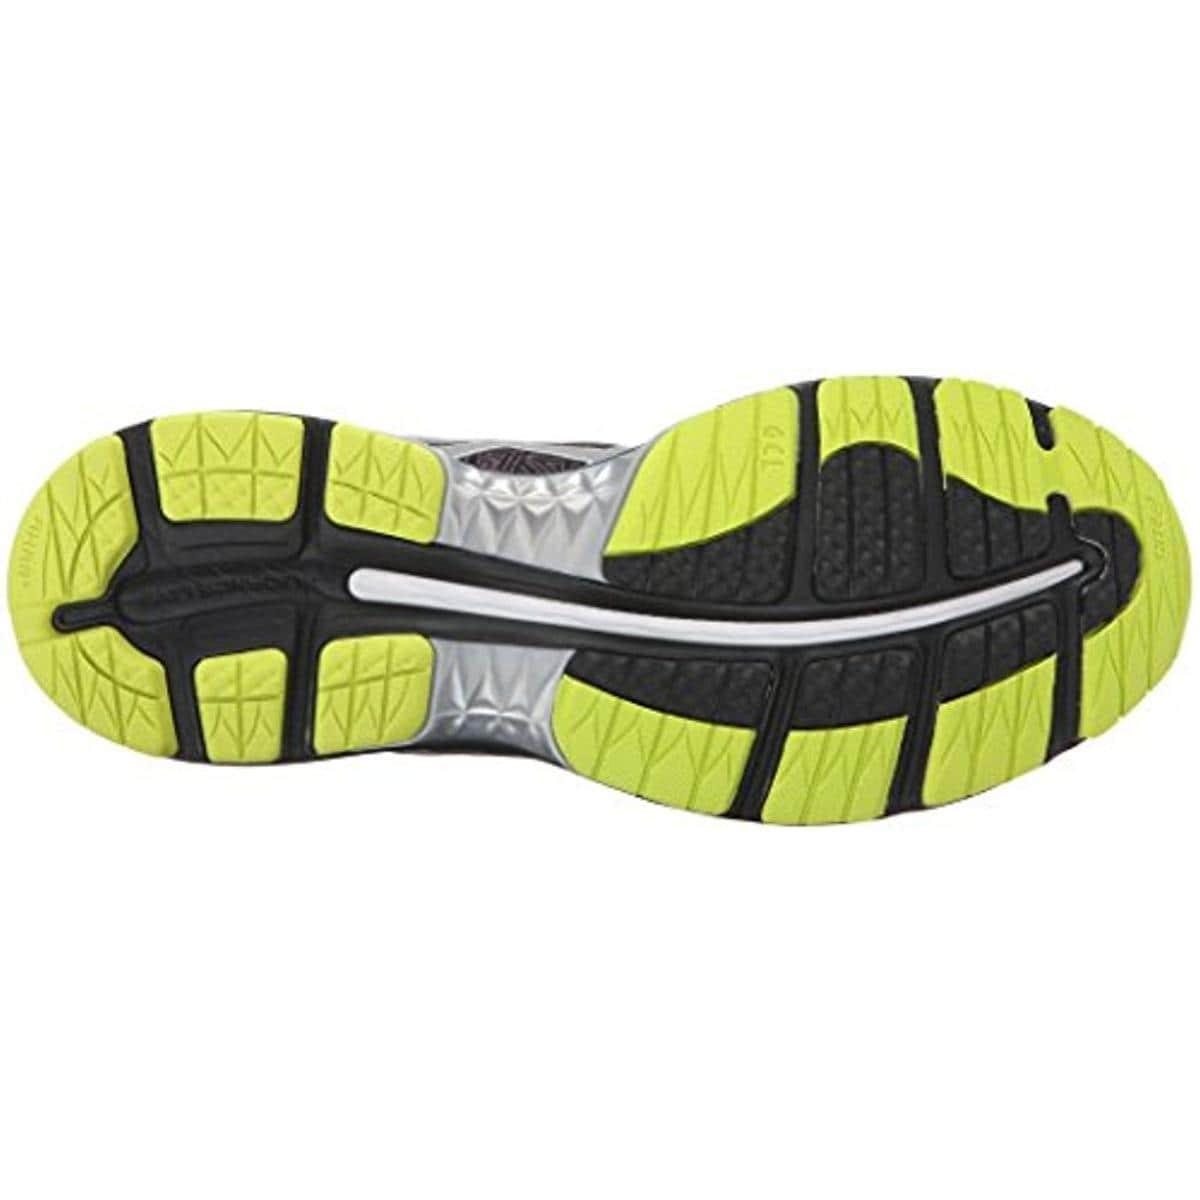 Asics Show Reflective Gel Shoes Nimbus 18 Lite Running Trainer Mens wk0XON8nP